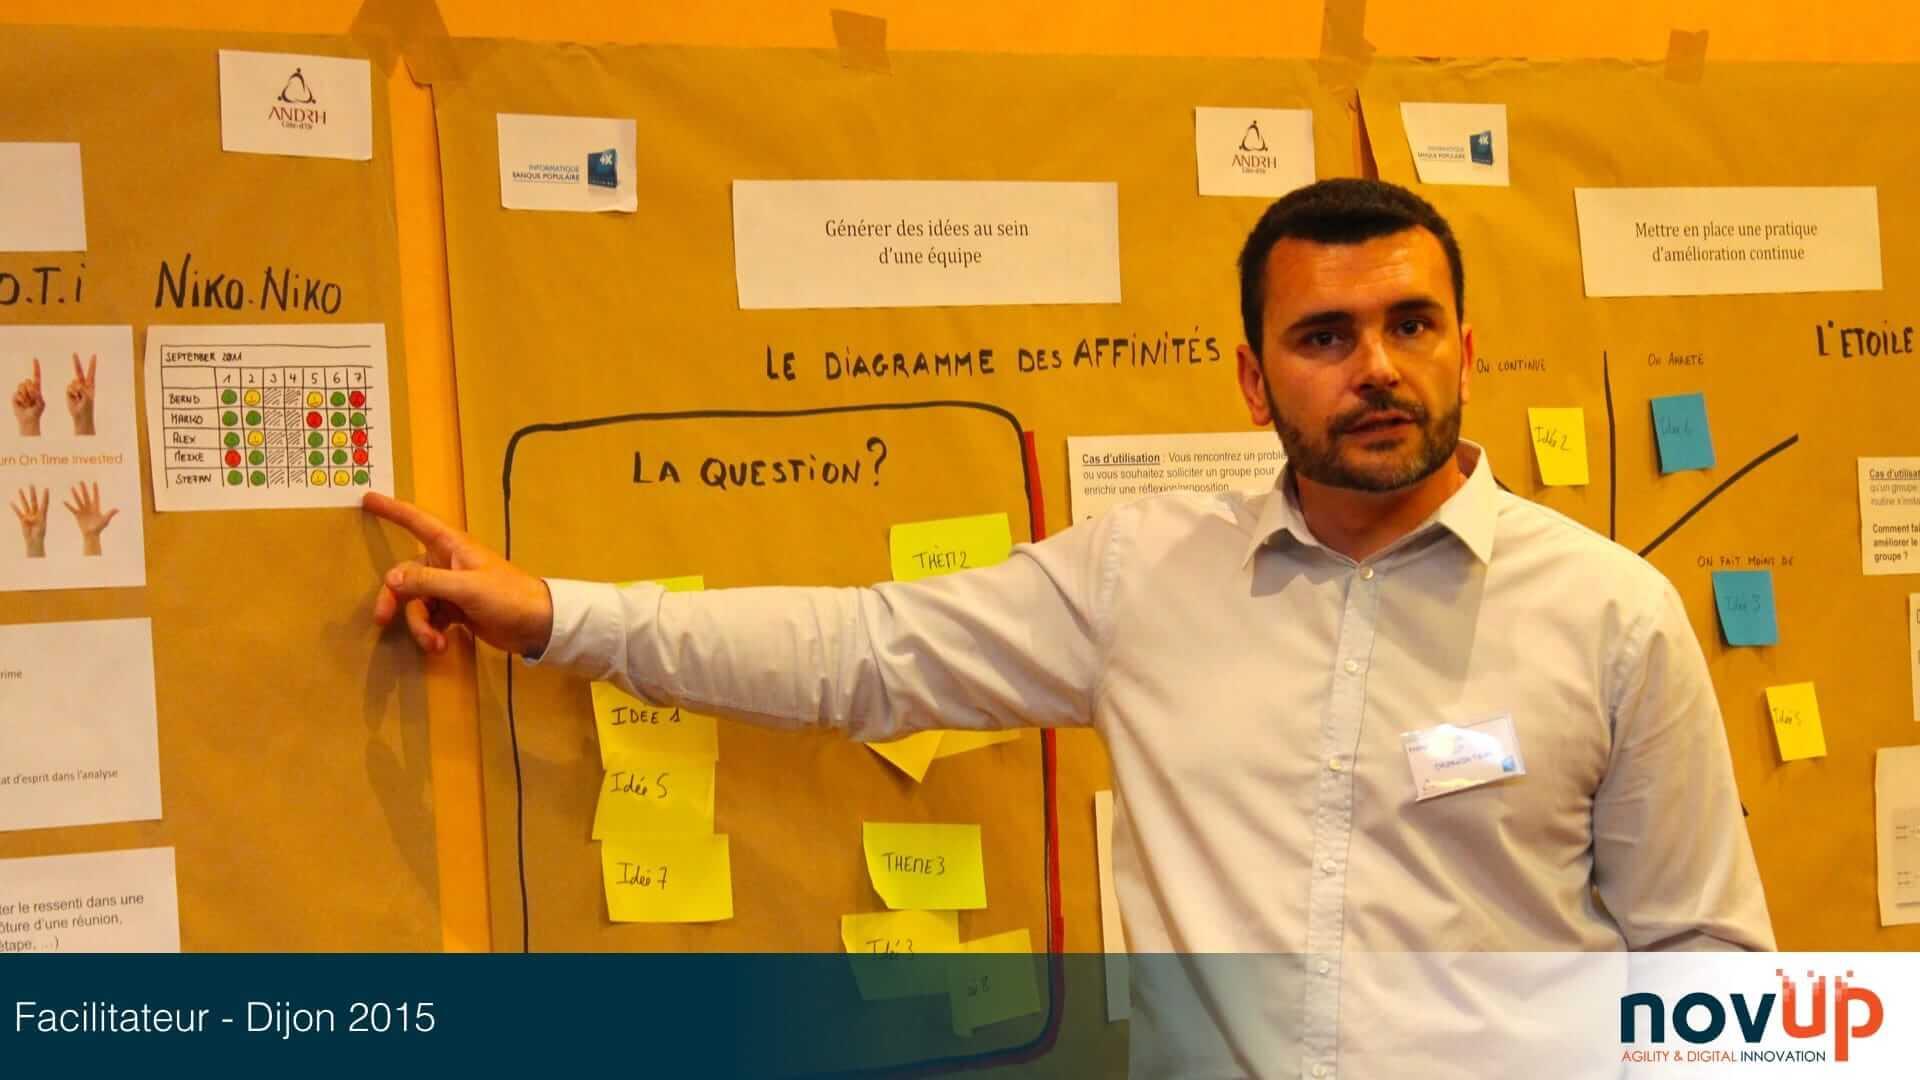 Facilitateur Dijon 2015